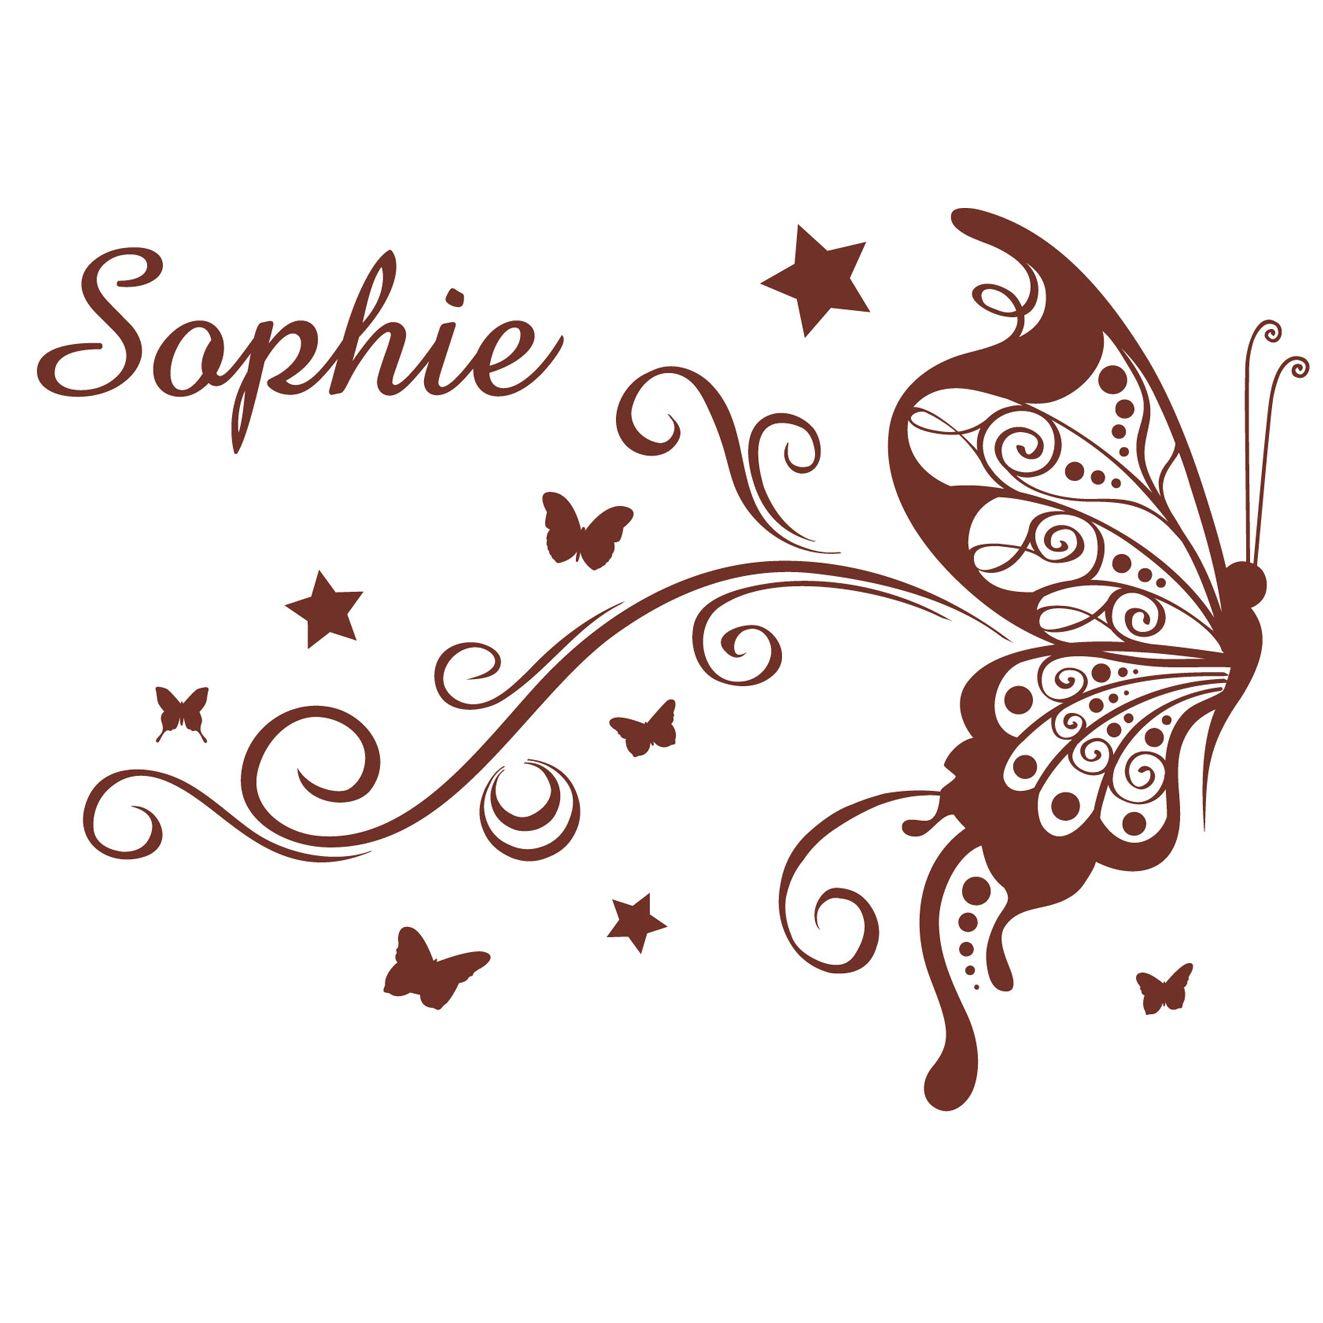 Dessin arabesque papillon stickers sticker mural prenom fille coeur arabesque papillo with - Stickers muraux personnalise ...